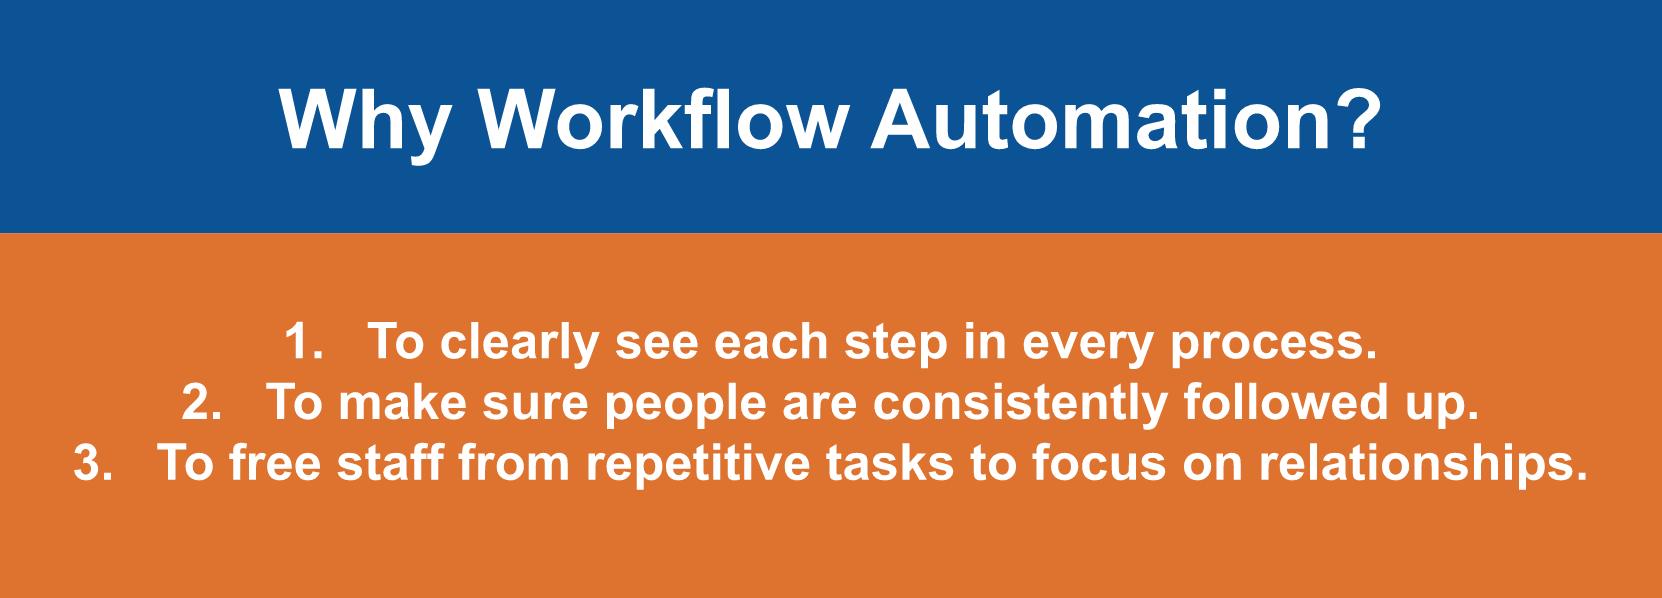 WorkflowAutomation